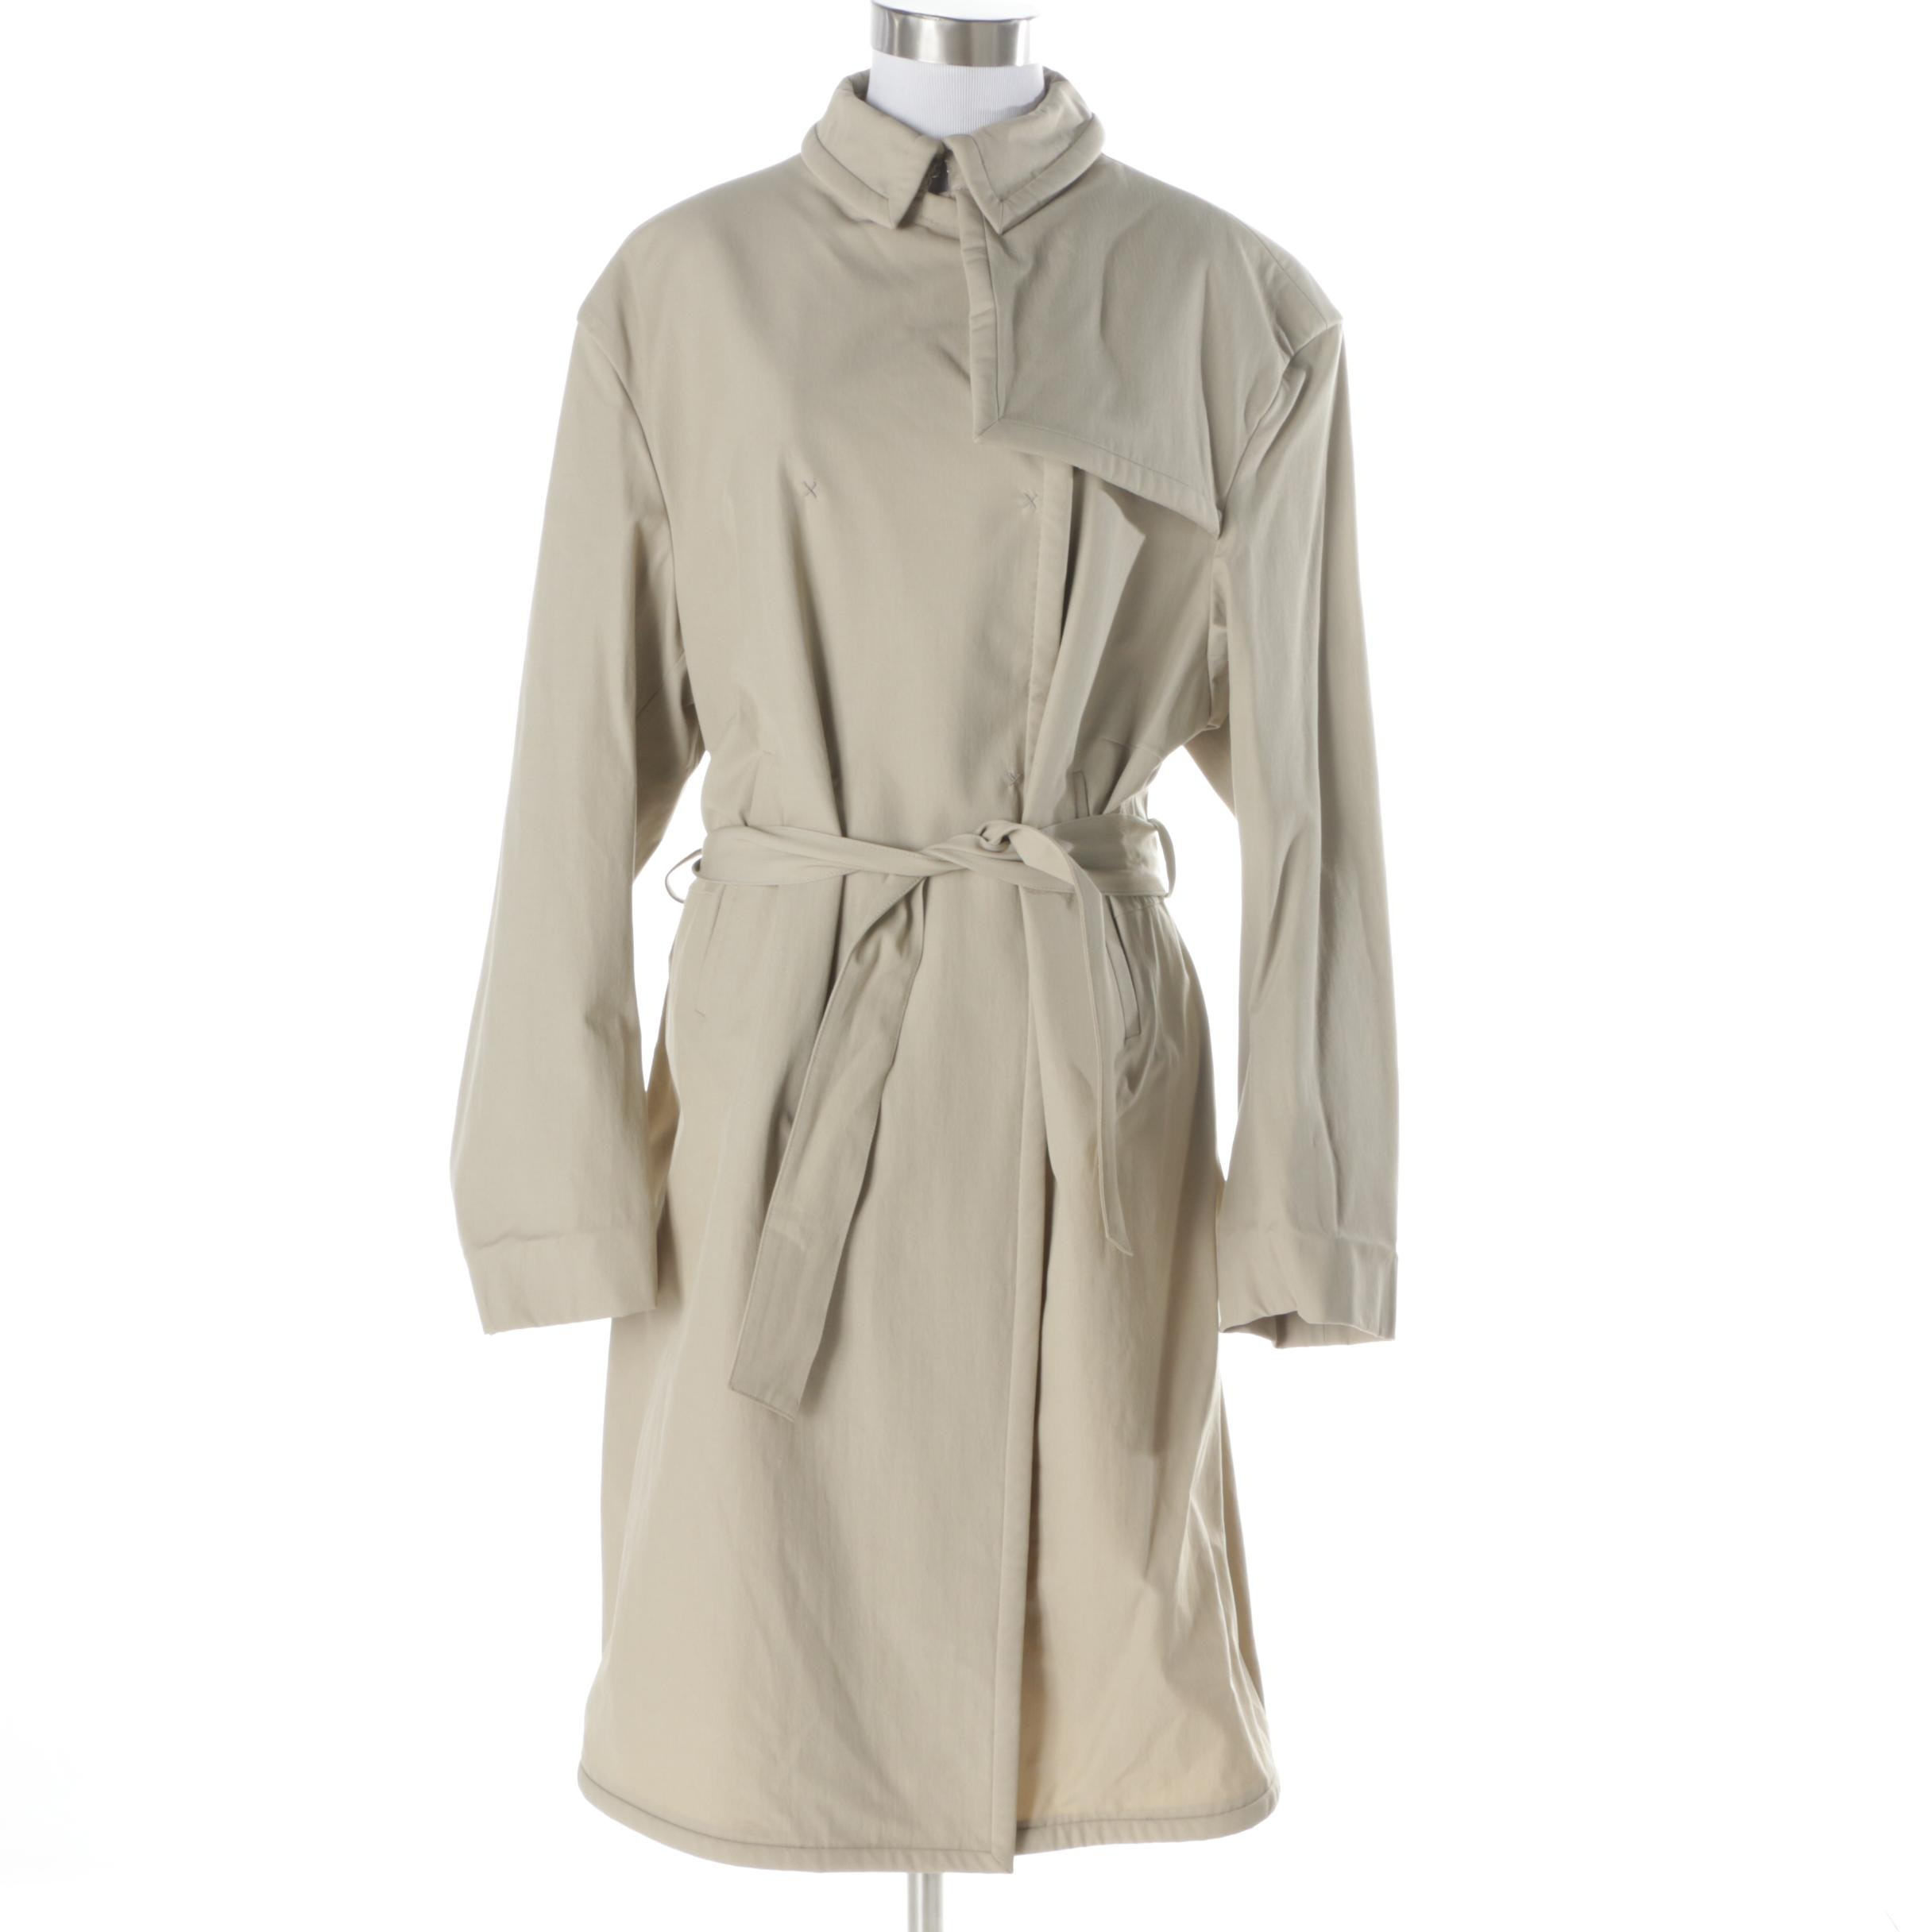 Women's Burberry Prorsum Trench Coat